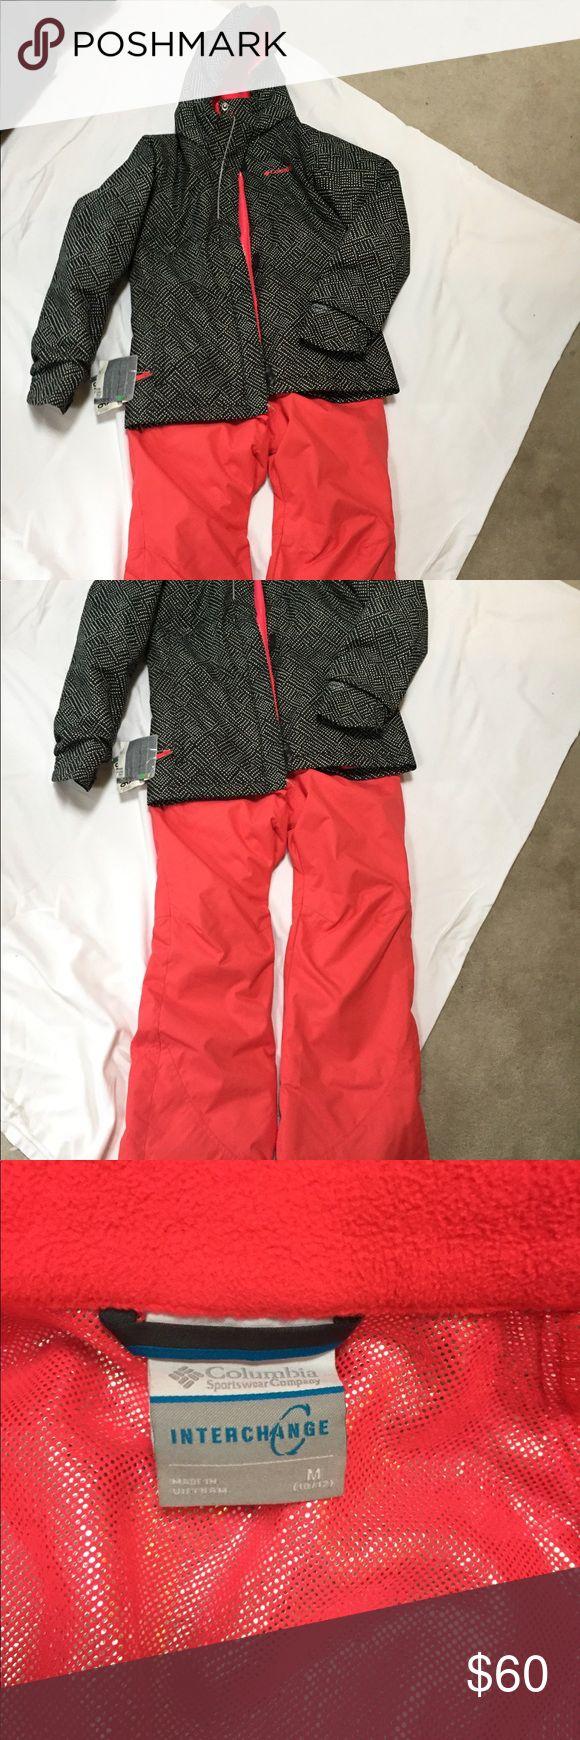 Columbia ski jacket and Burton ski pants Girls Columbia ski jacket. Zippered lining with metallic heat liner. Burton lined girls ski pants.  Excellent condition , used one season. columbia & Burton Matching Sets